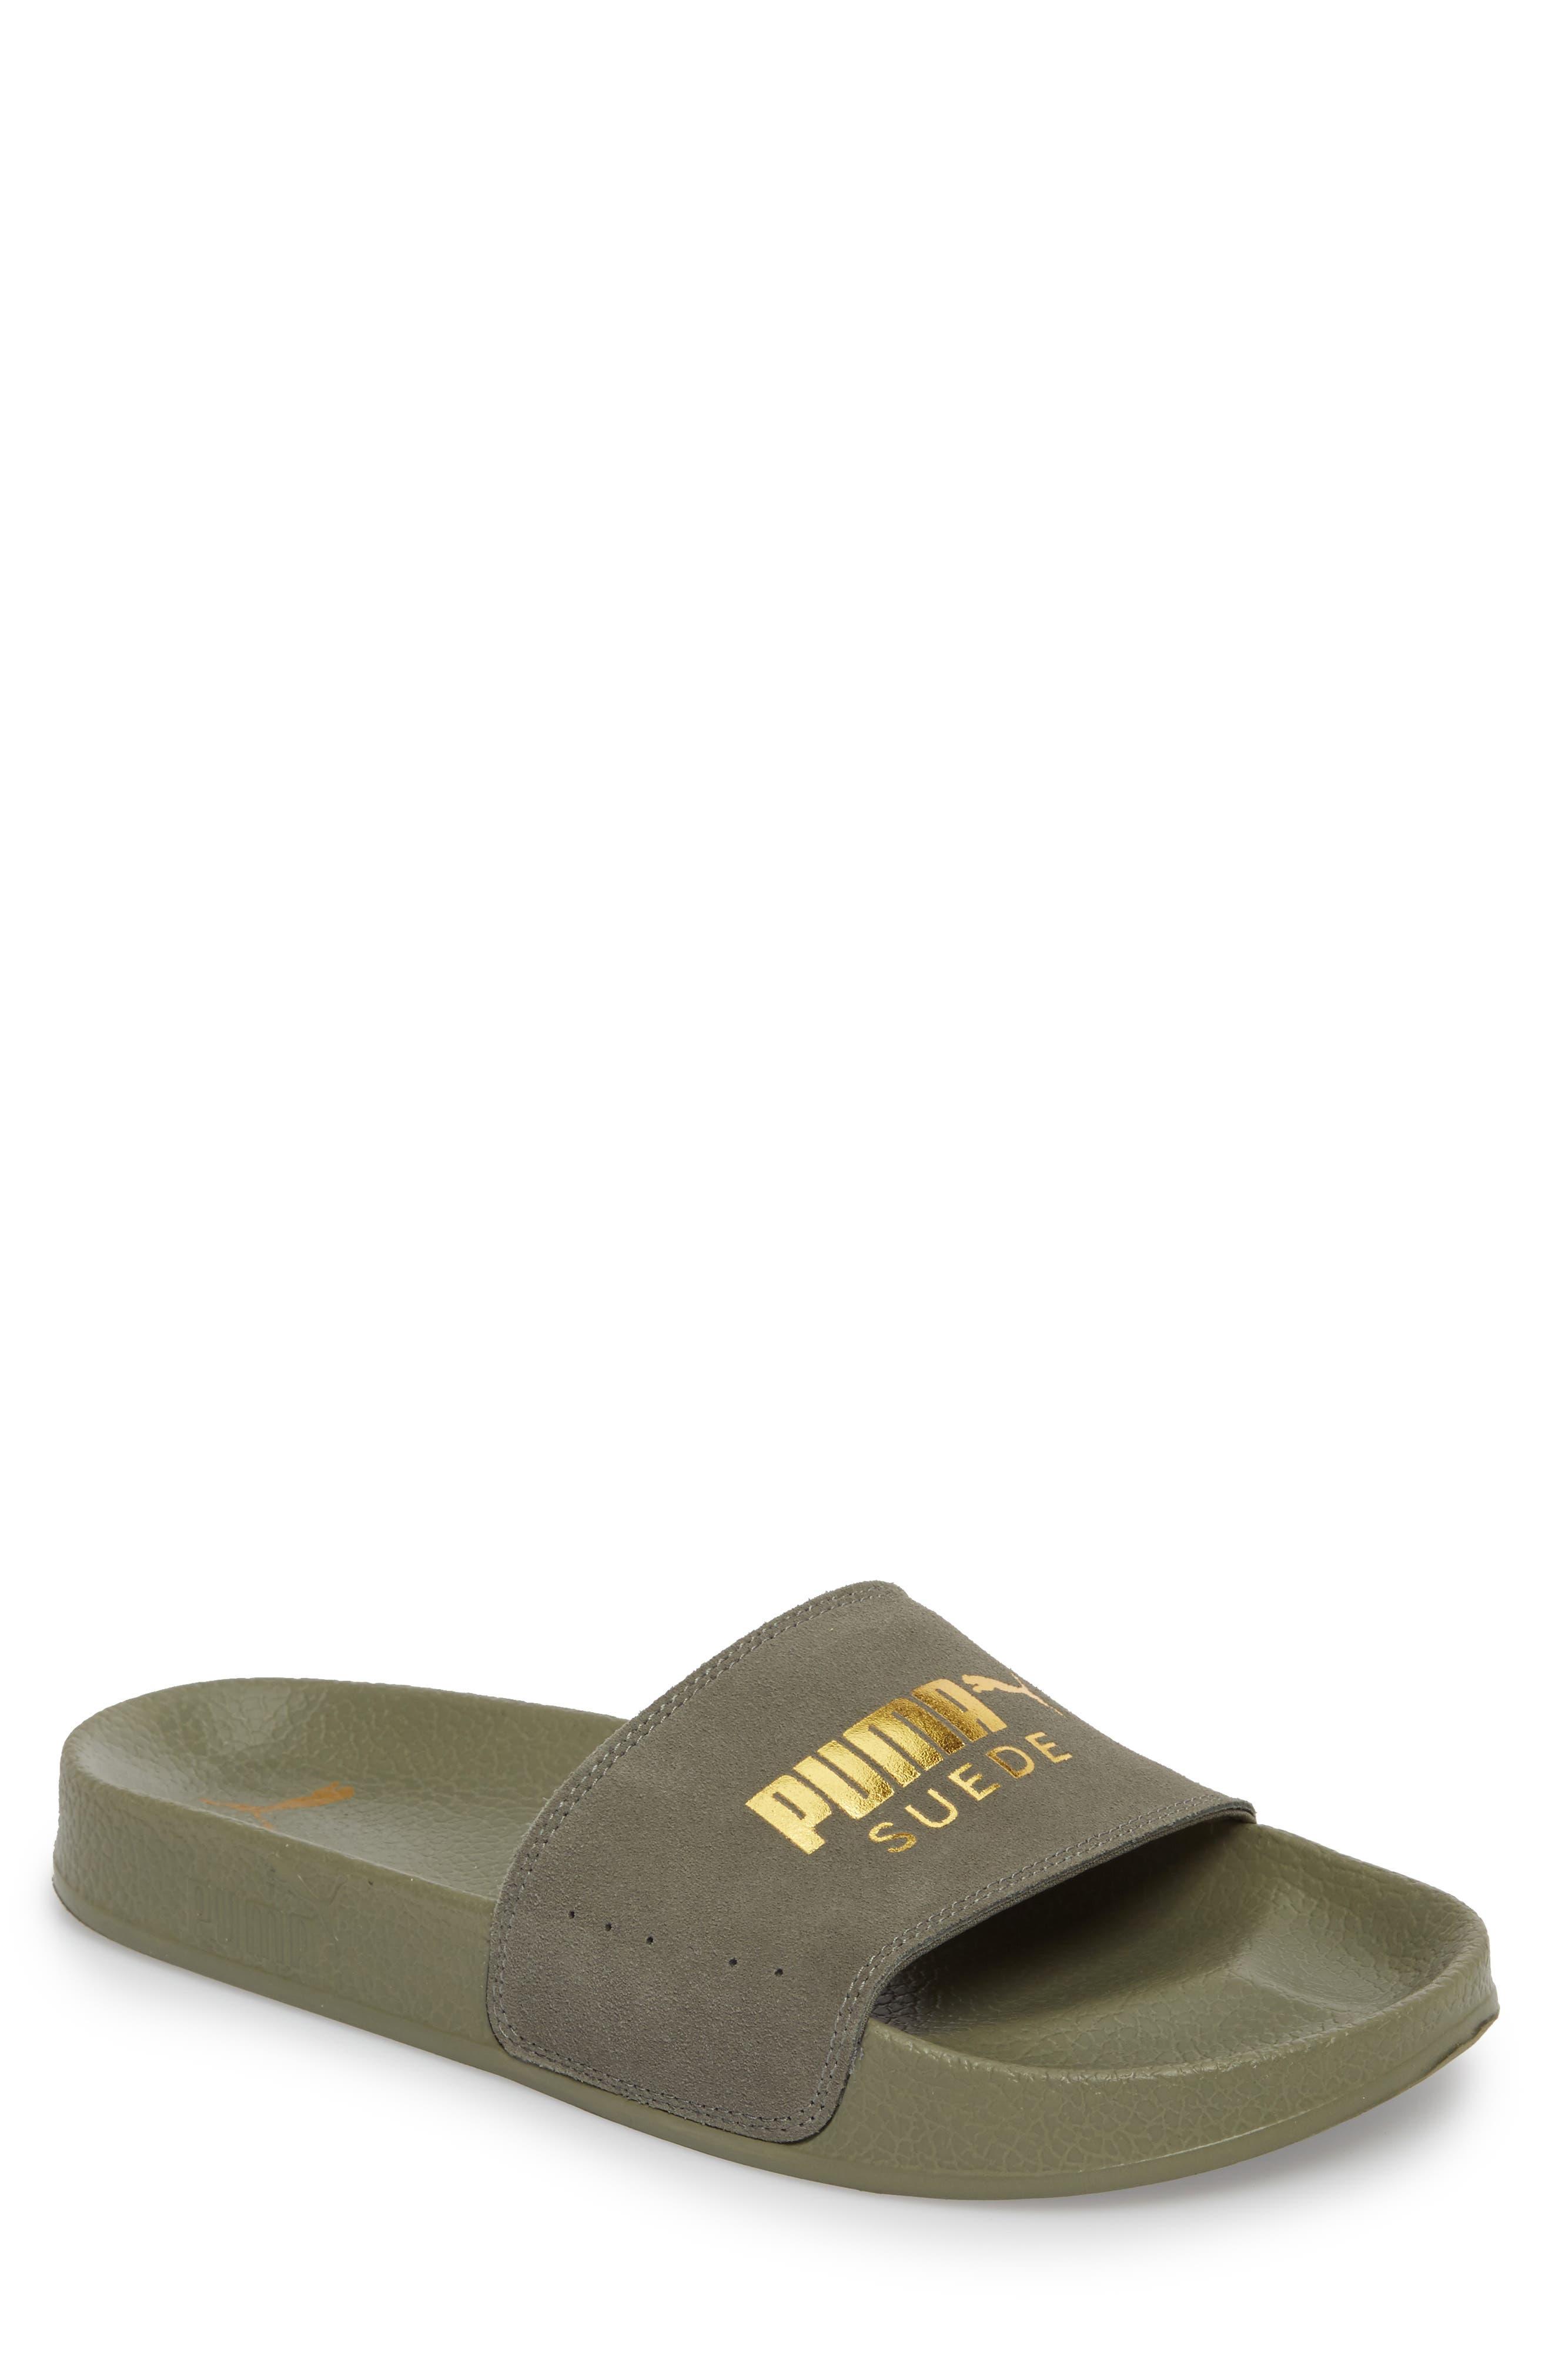 PUMA Leadcat Suede Slide Sandal (Men)